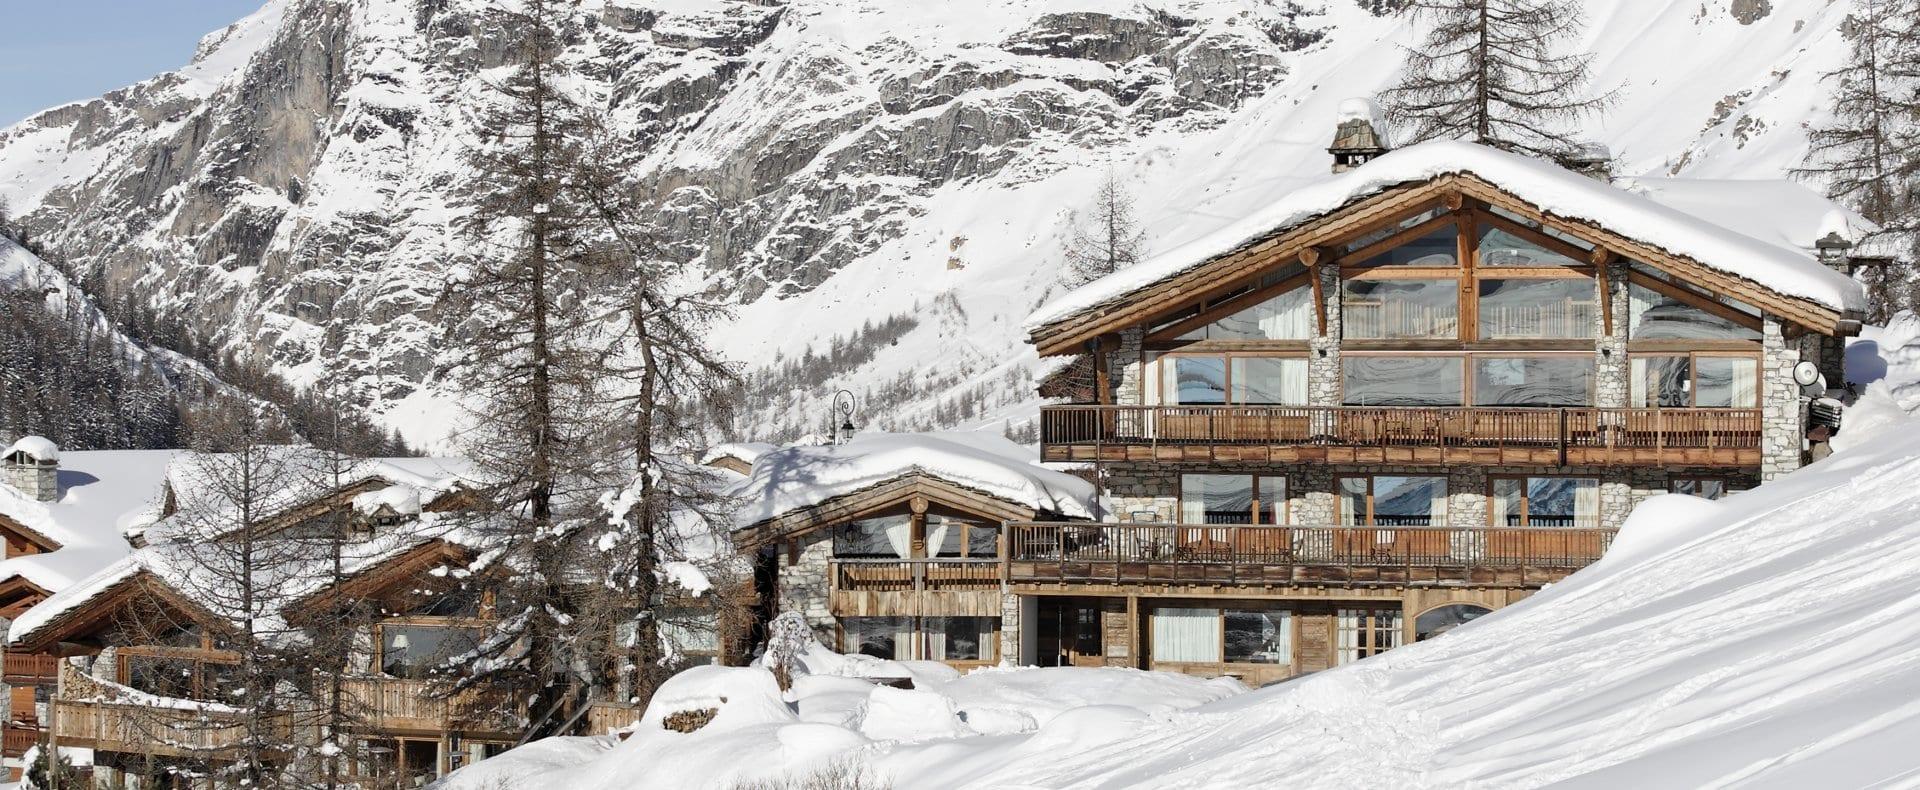 Exterior-Chalet-Le-Chardon-Val-d'Isere-Ultimate-Luxury-Chalets-UltraVilla